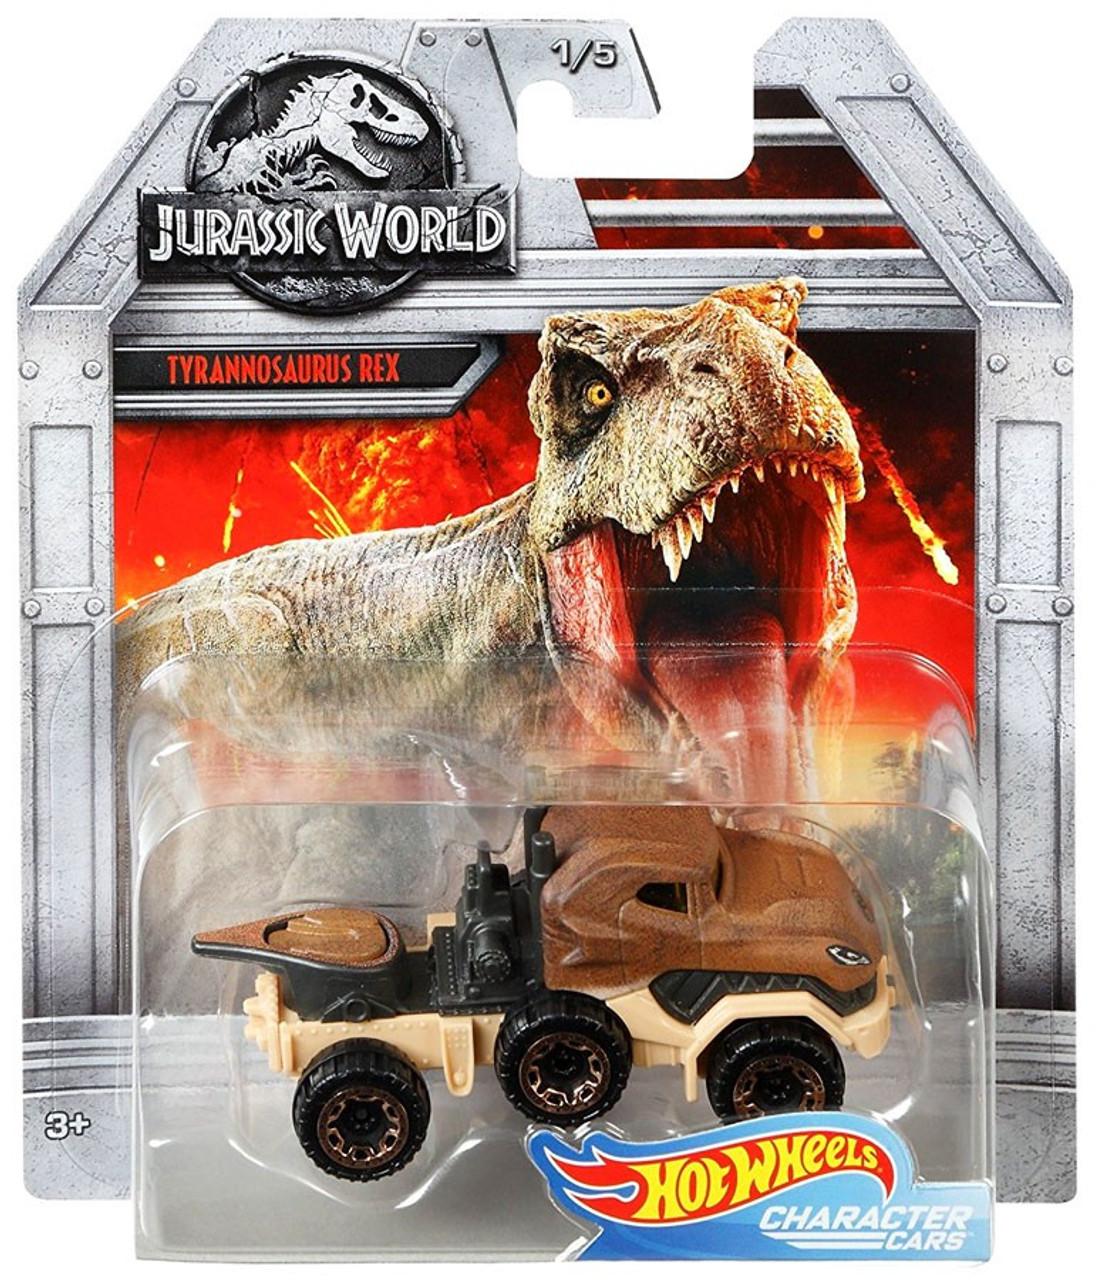 Combined Postage HOT WHEELS DIECAST Stegosaurus 4//5 Jurassic World